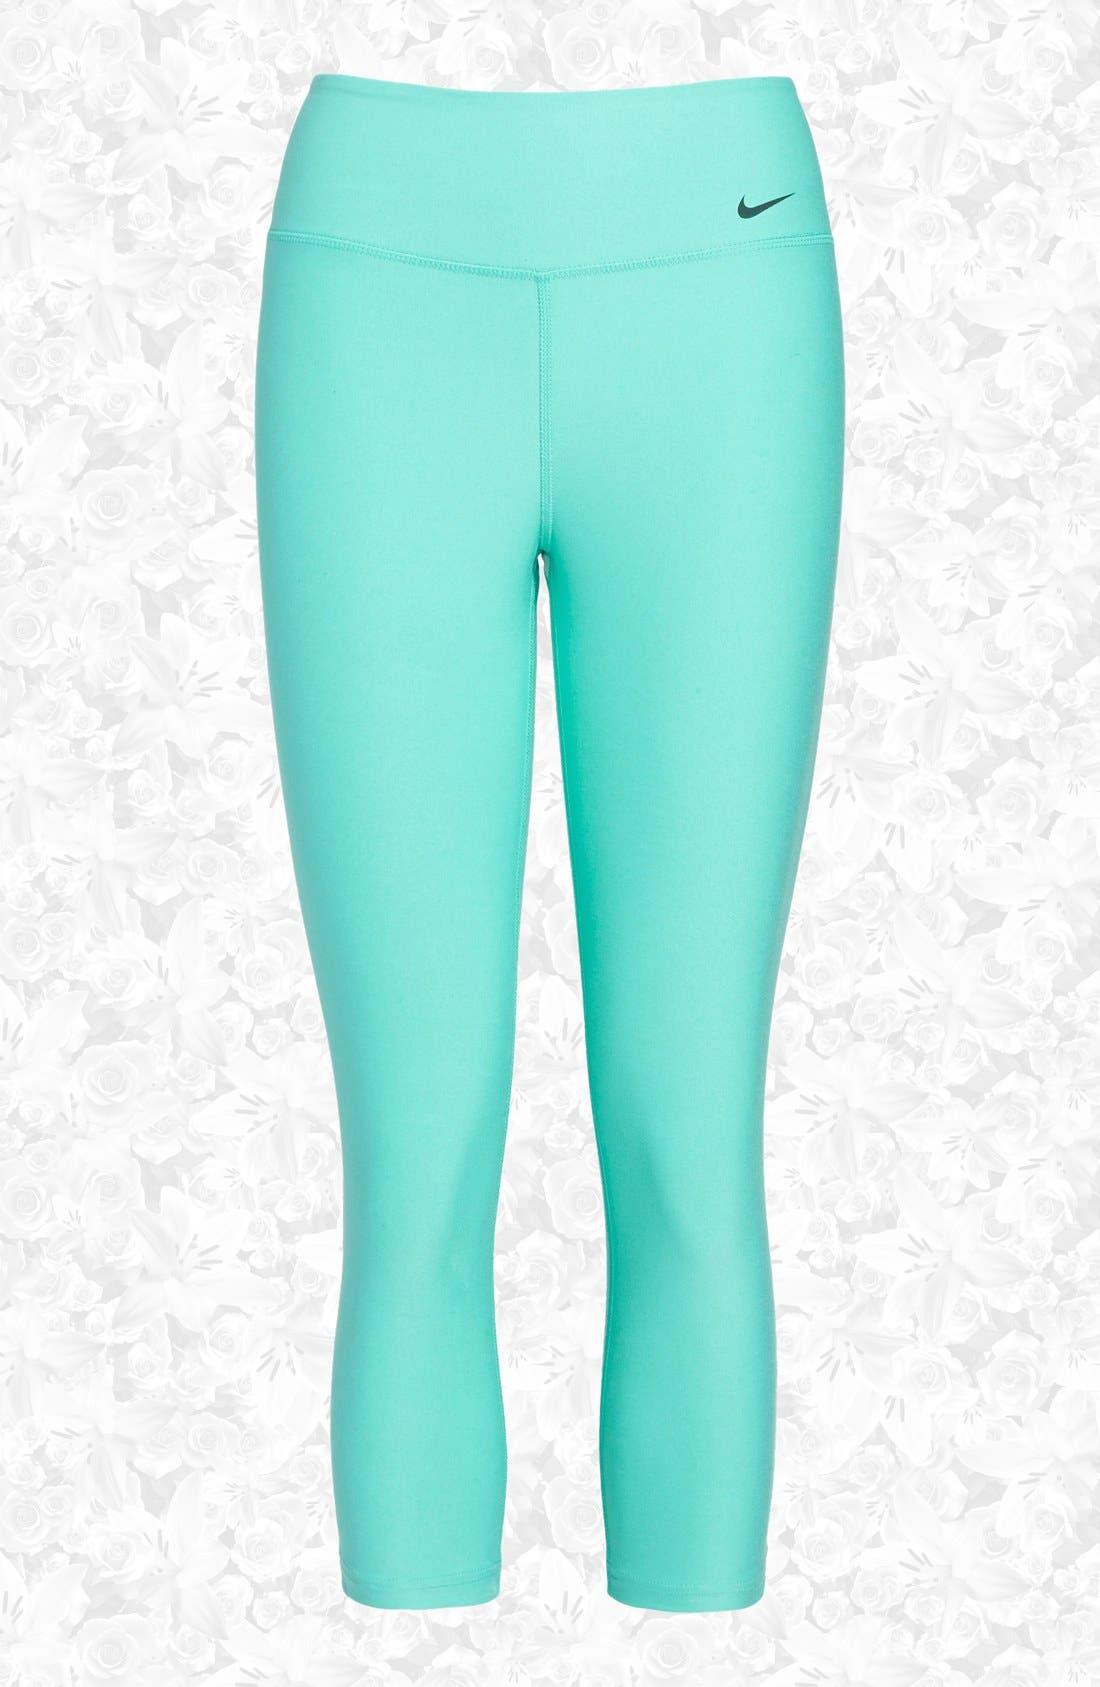 Alternate Image 1 Selected - Nike 'Legend 2.0 Tight Poly' Dri-FIT Training Capri Leggings (Women)